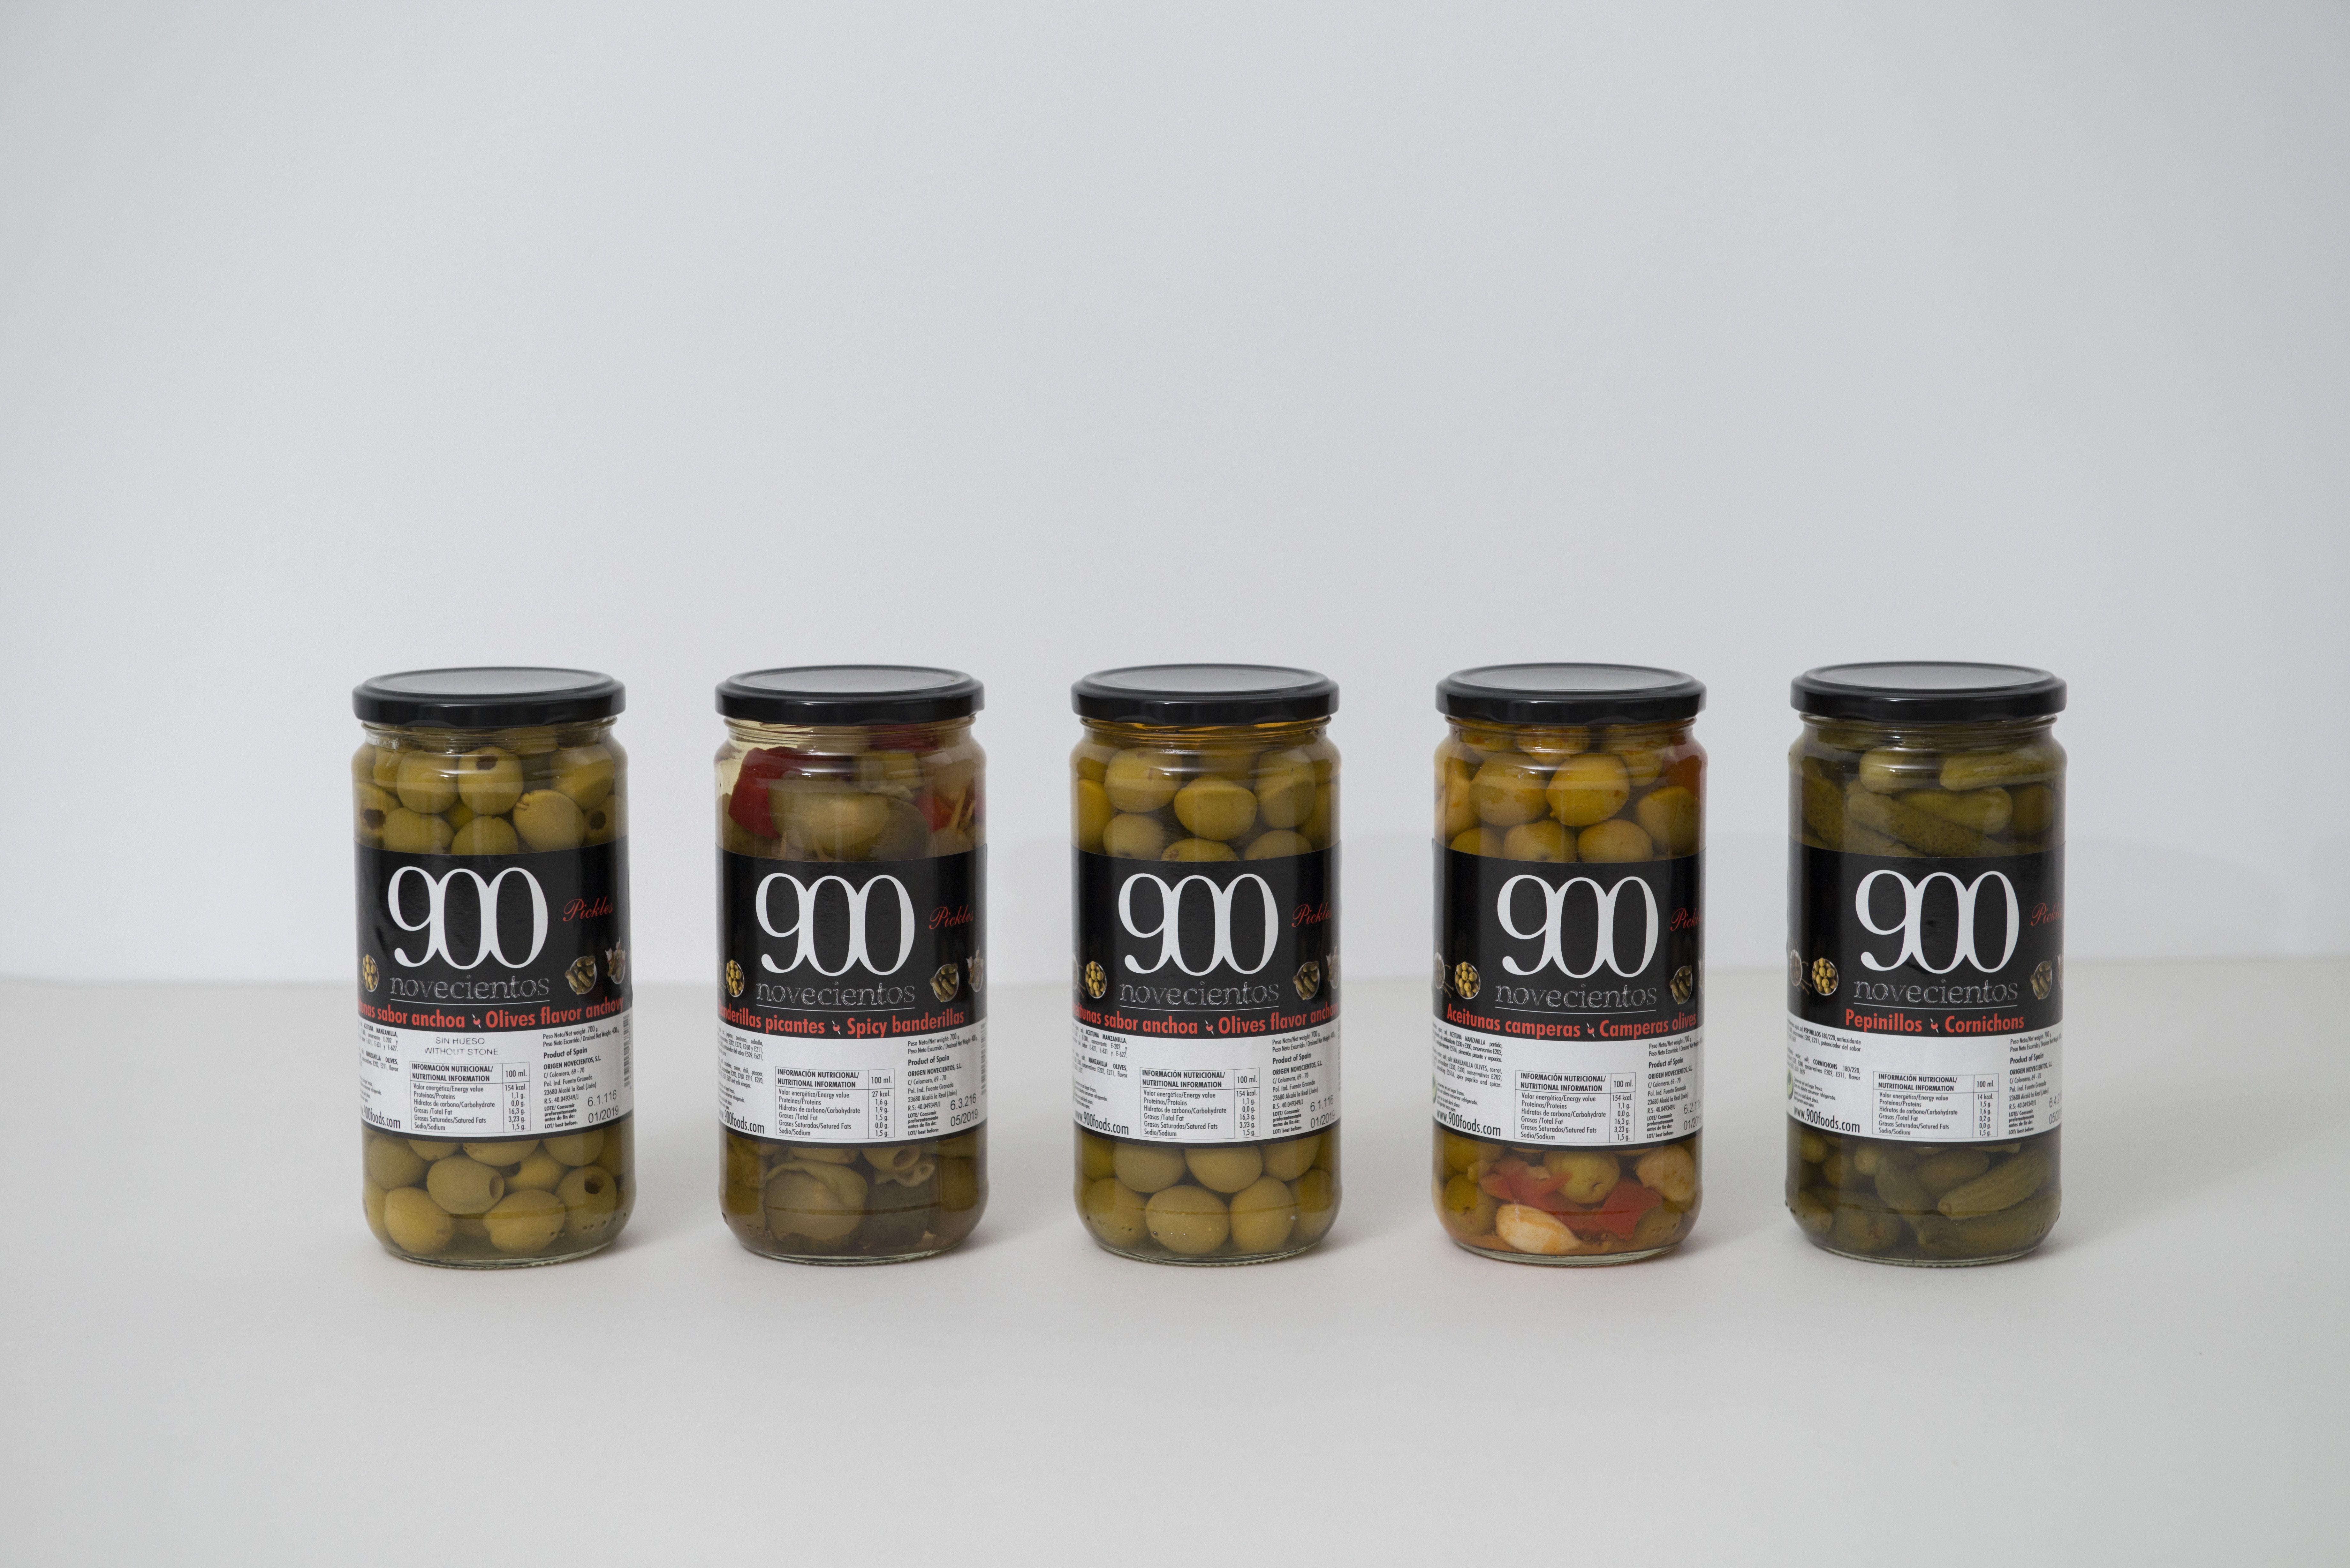 900 balance en Jaén